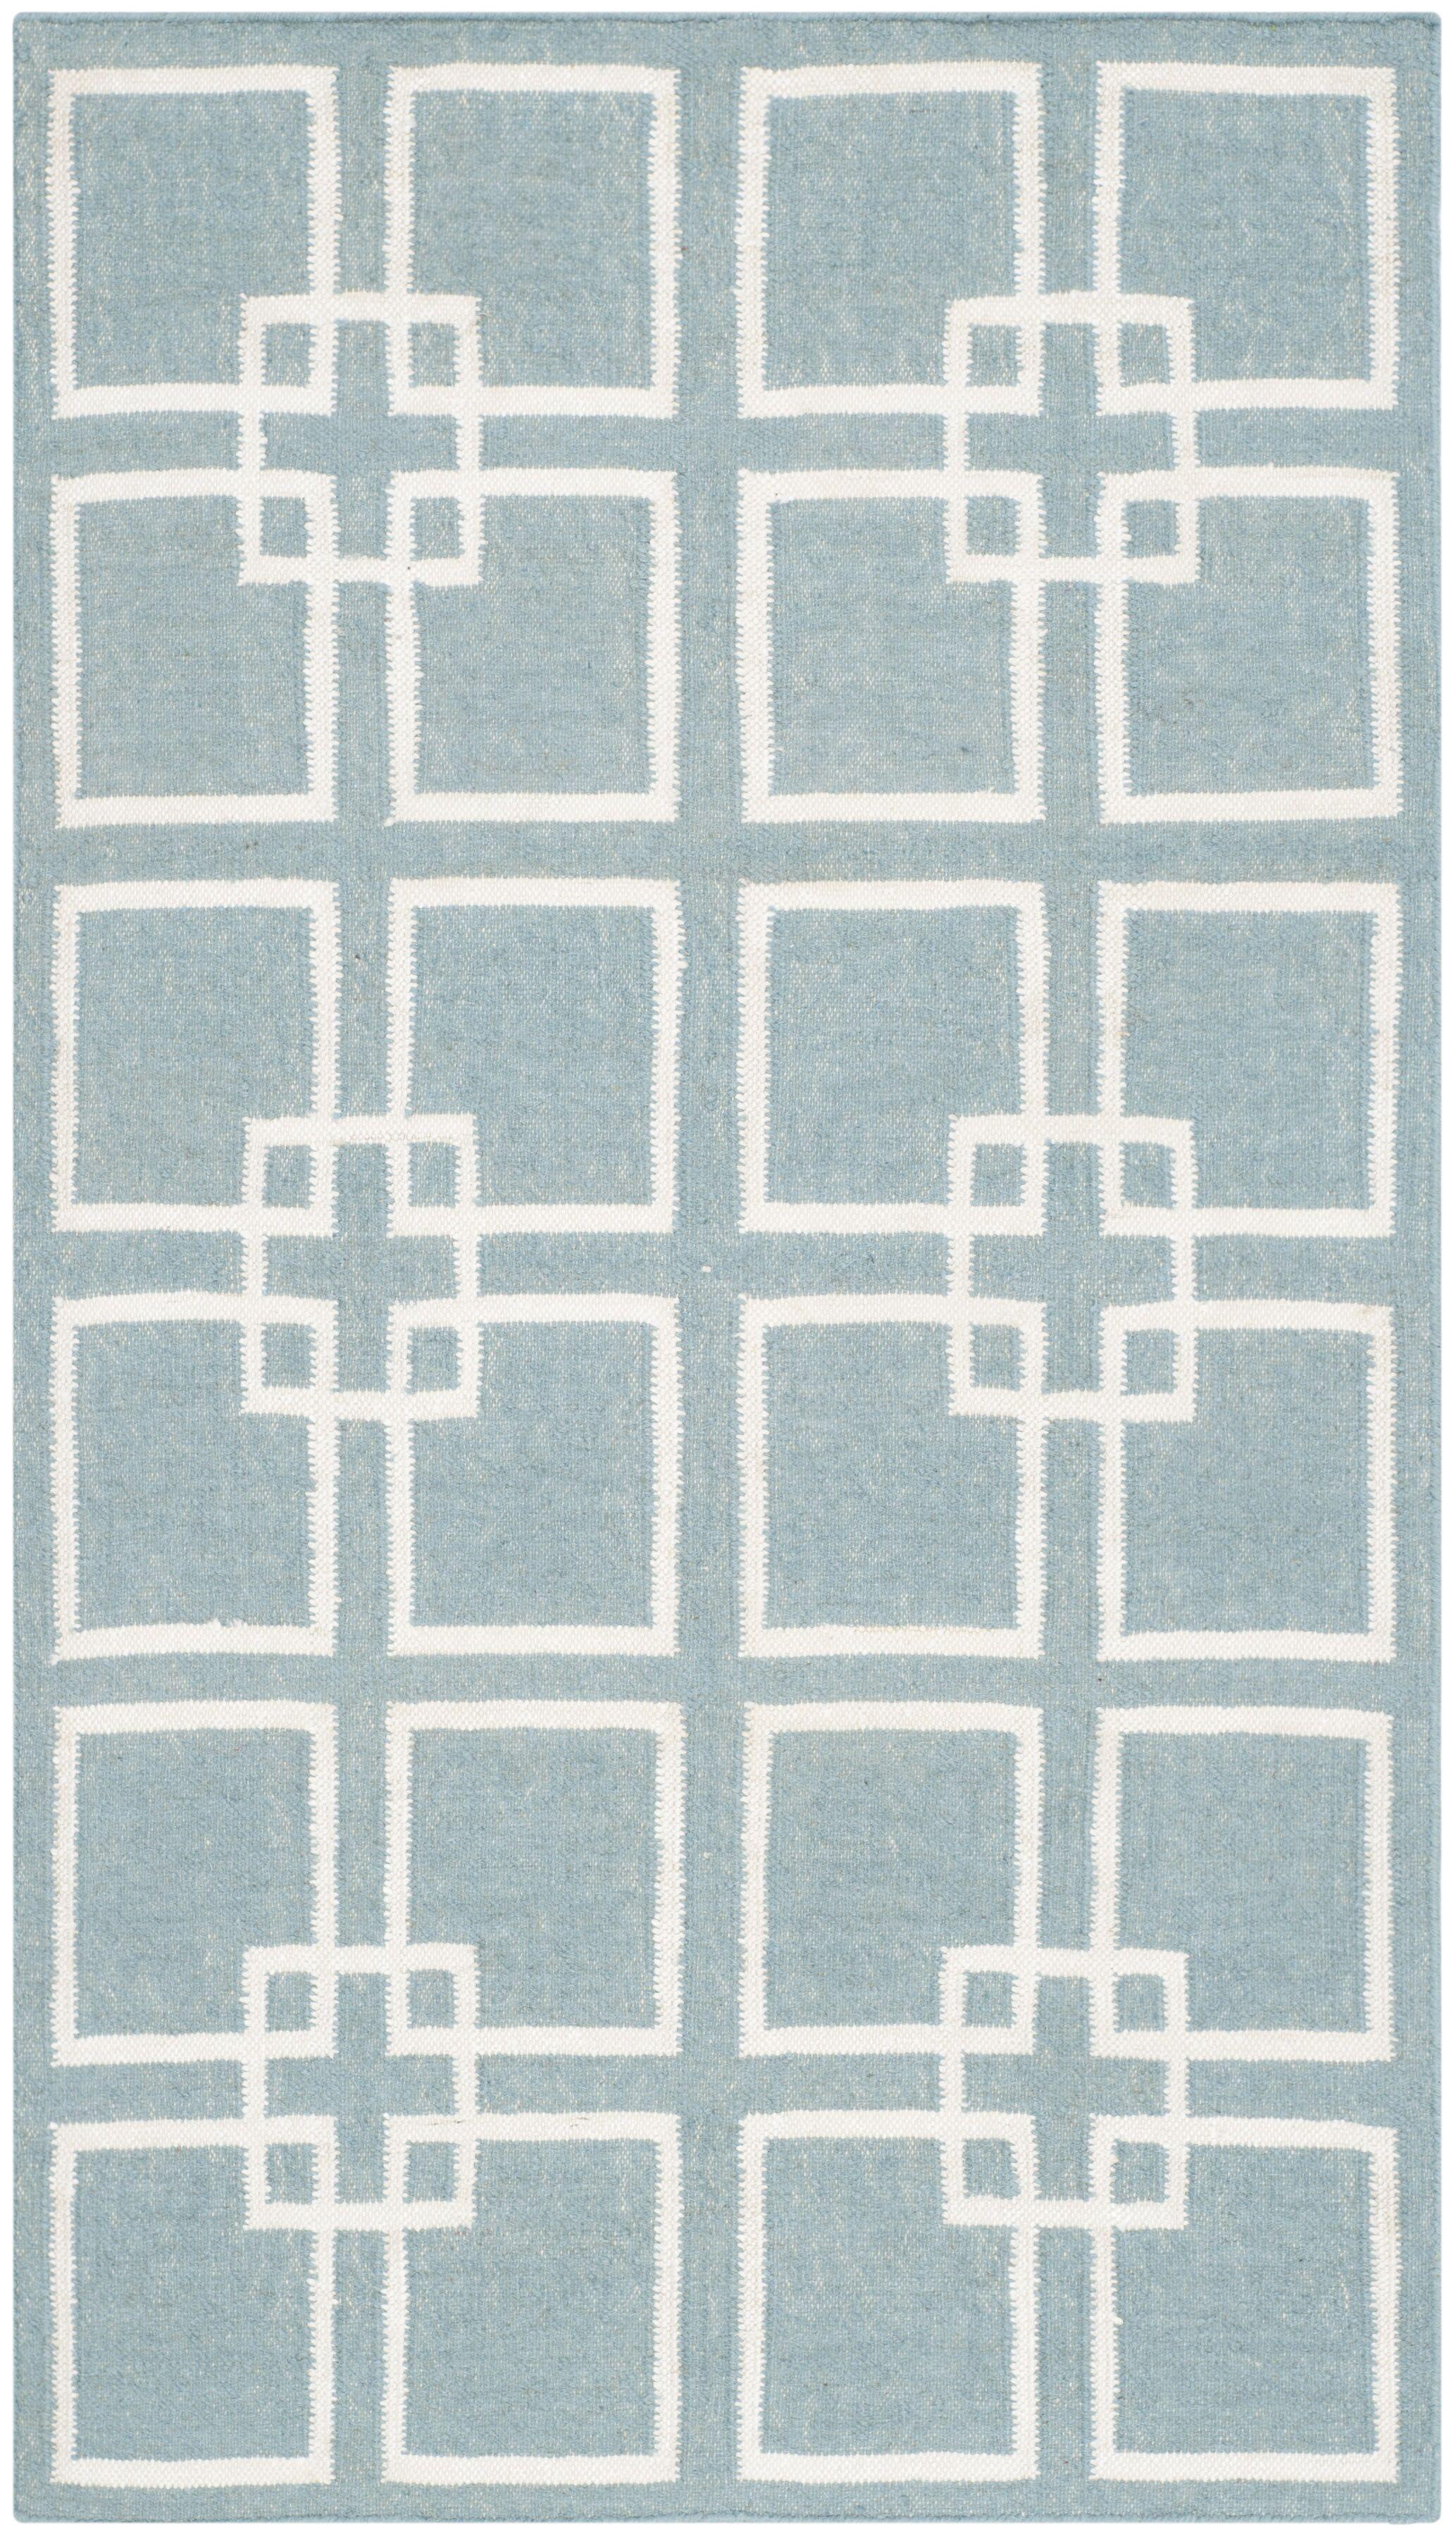 Square Dance Geyser Blue Area Rug Rug Size: Rectangle 3' x 5'